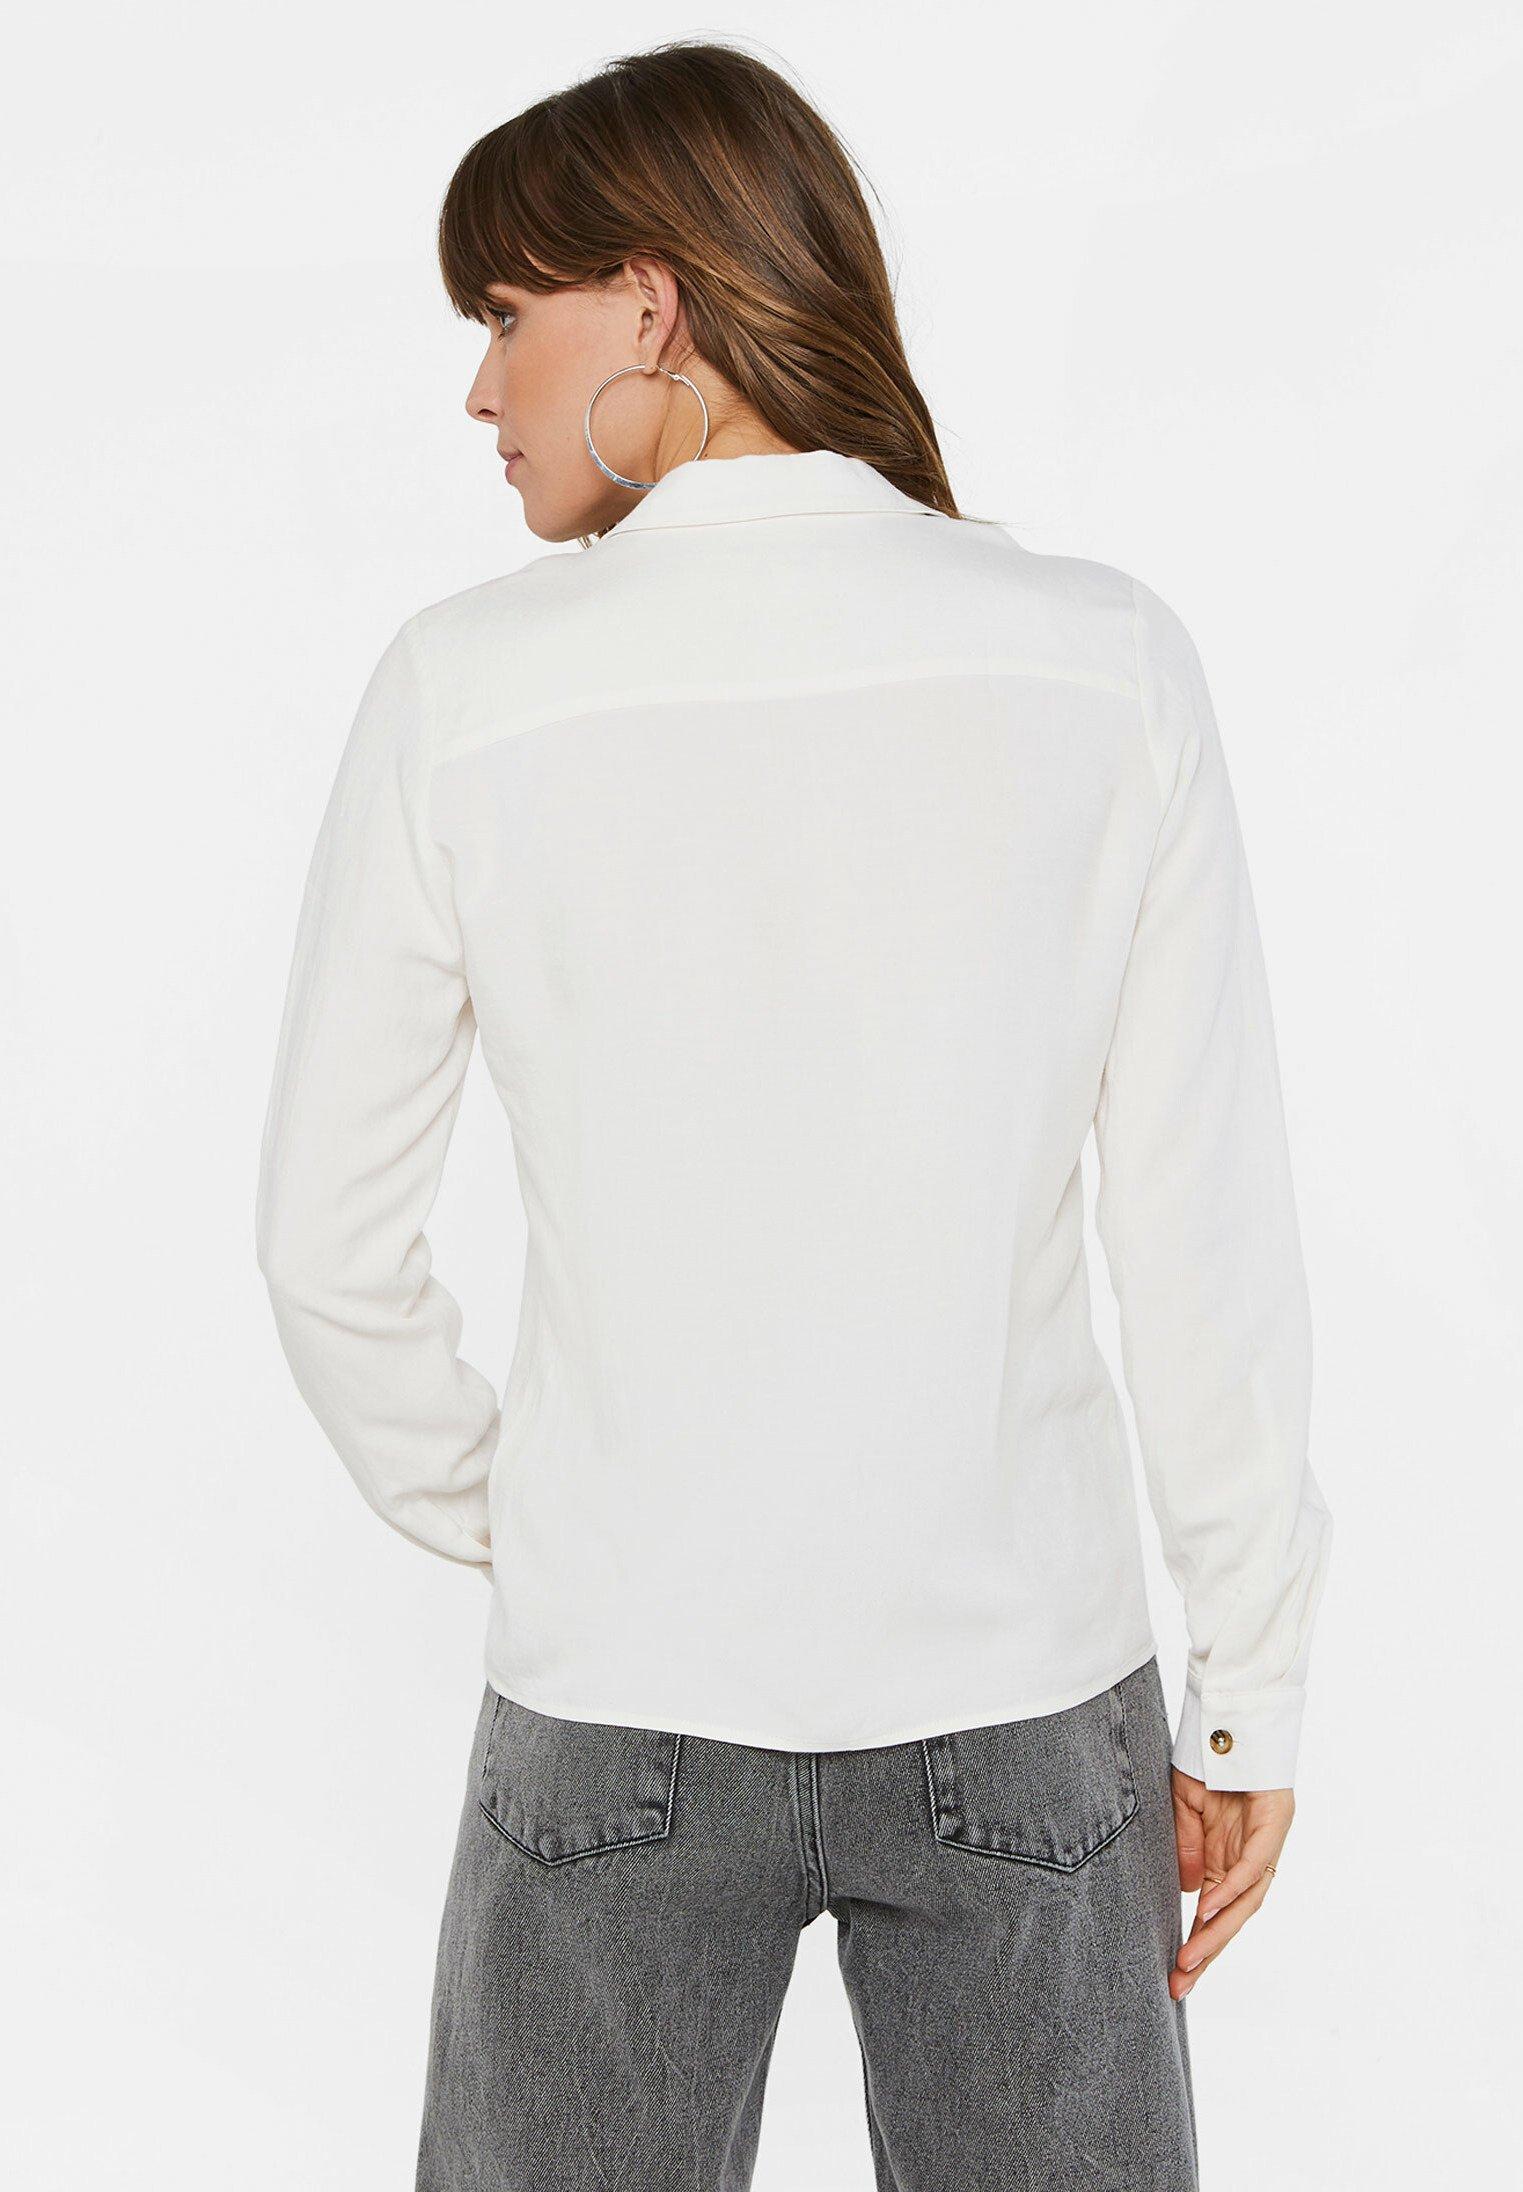 Grote Korting Best Verkopende Dameskleding sdkjGX55lghisd WE Fashion Overhemdblouse ecru QmWh5QQ